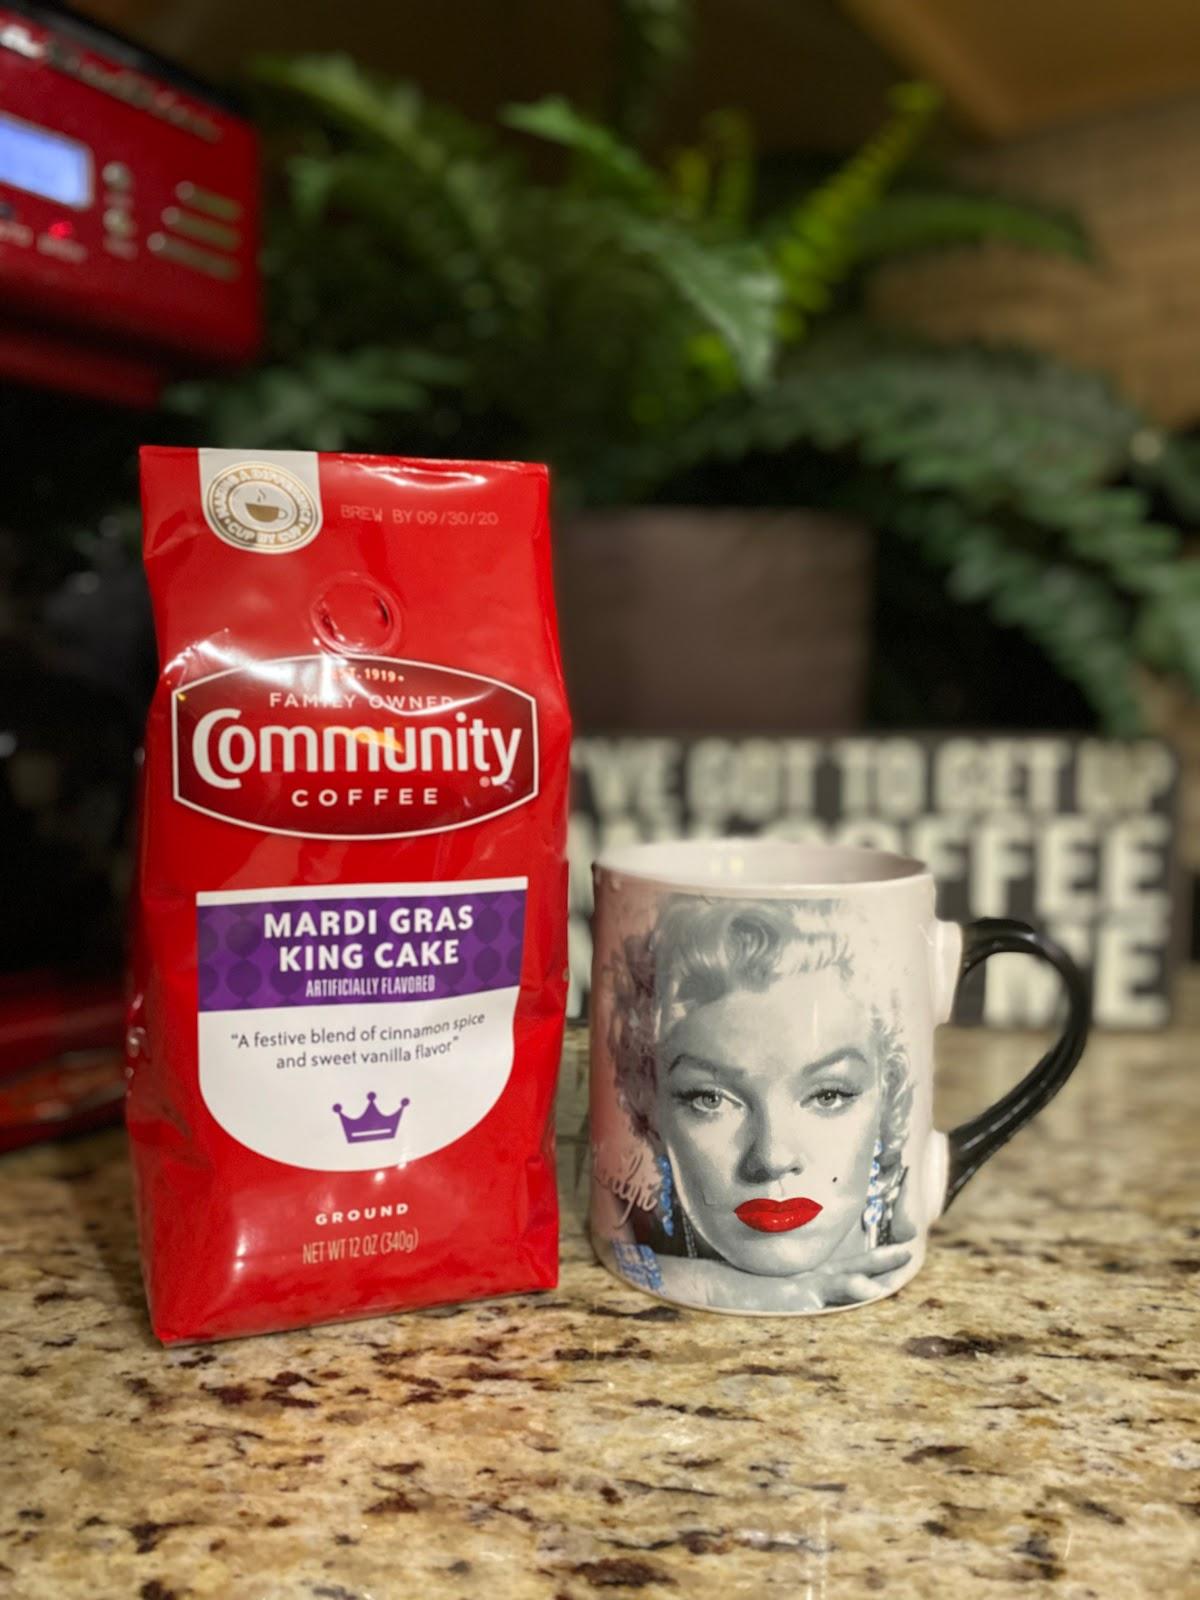 Community Mardi Gras Coffee and Marilyn Monroe Vintage Cup. Weekend Bits And Favorites